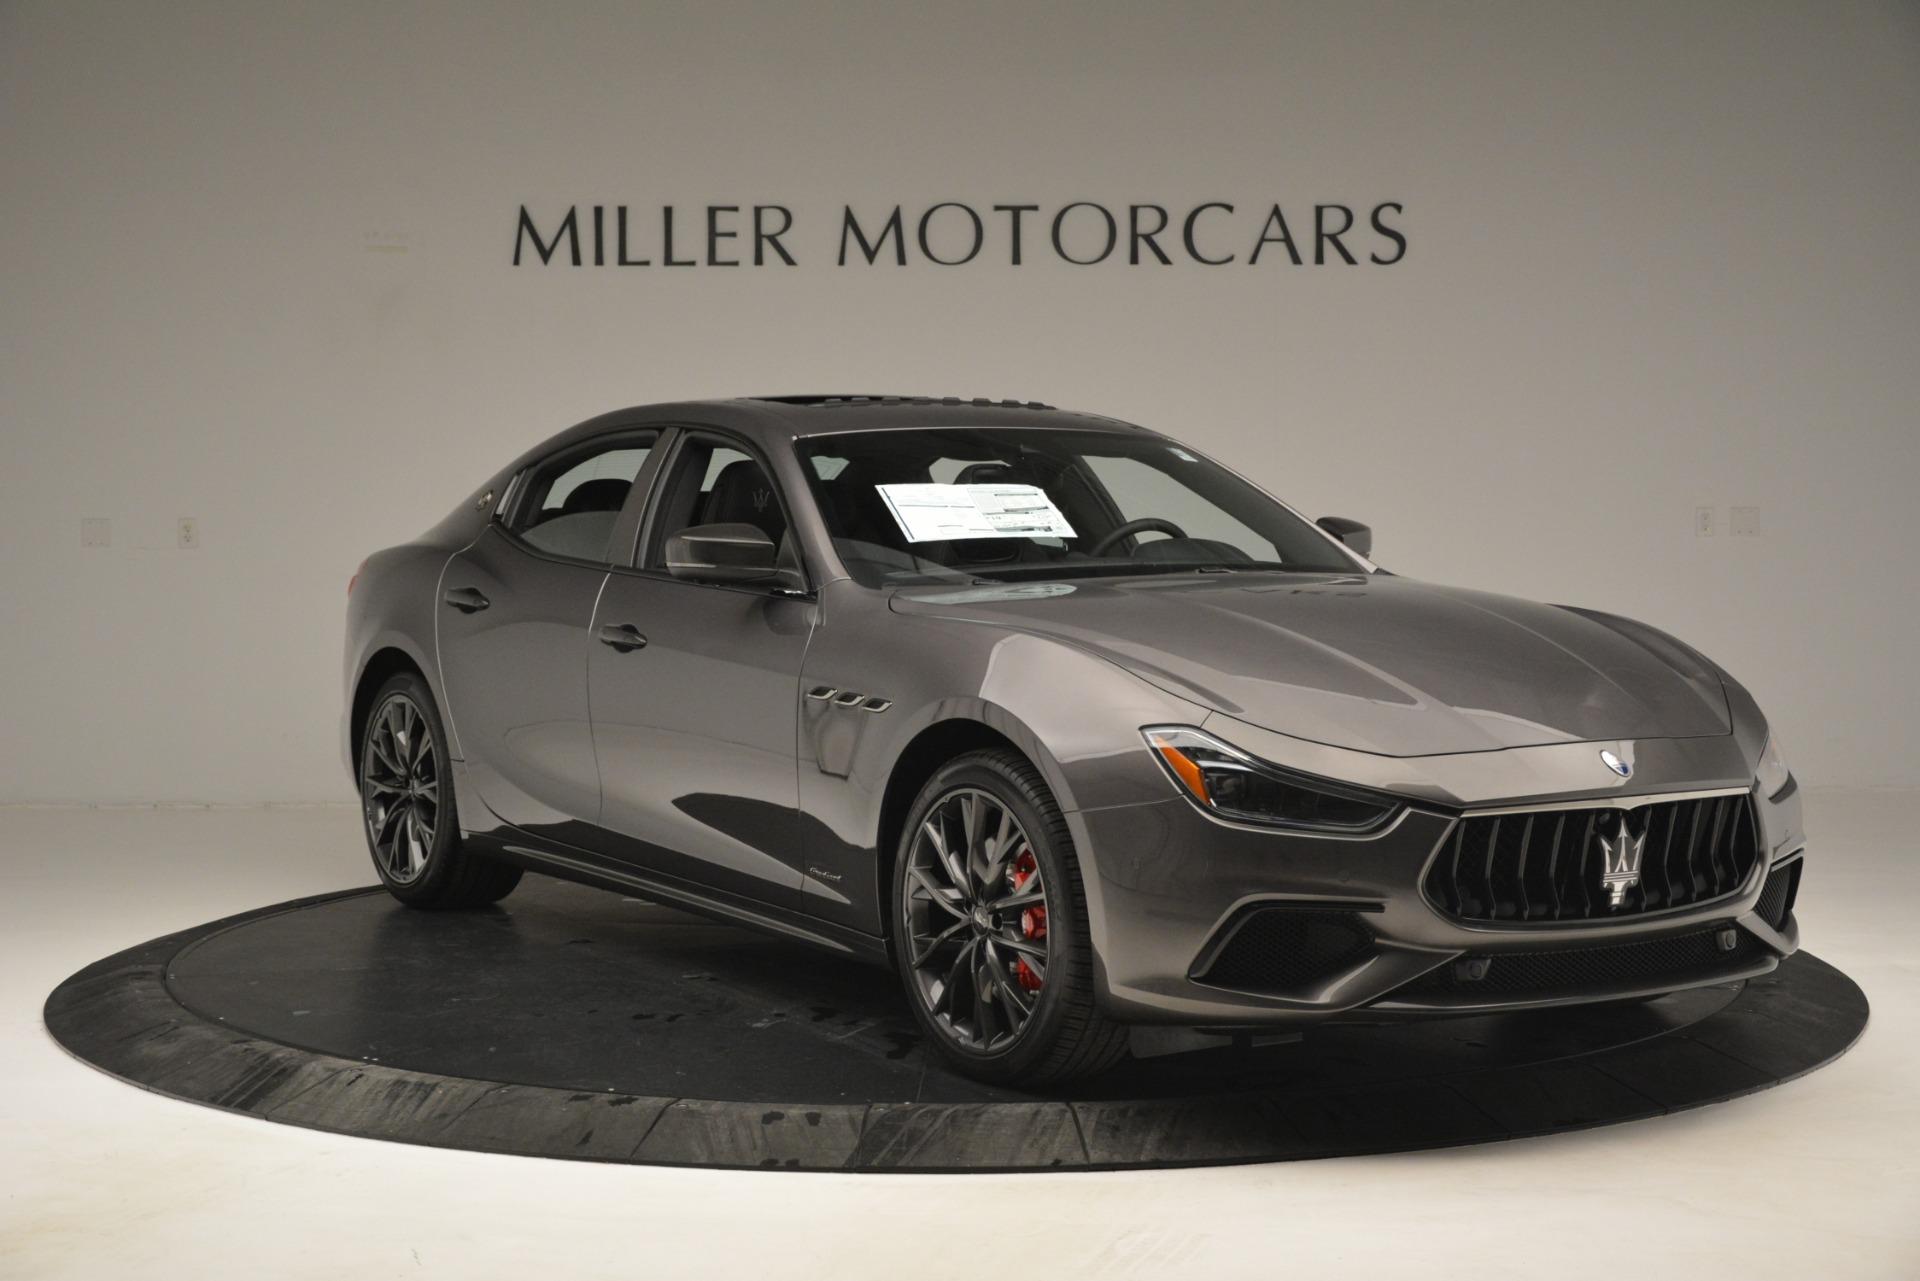 New 2019 Maserati Ghibli S Q4 GranSport For Sale In Greenwich, CT 2925_p12